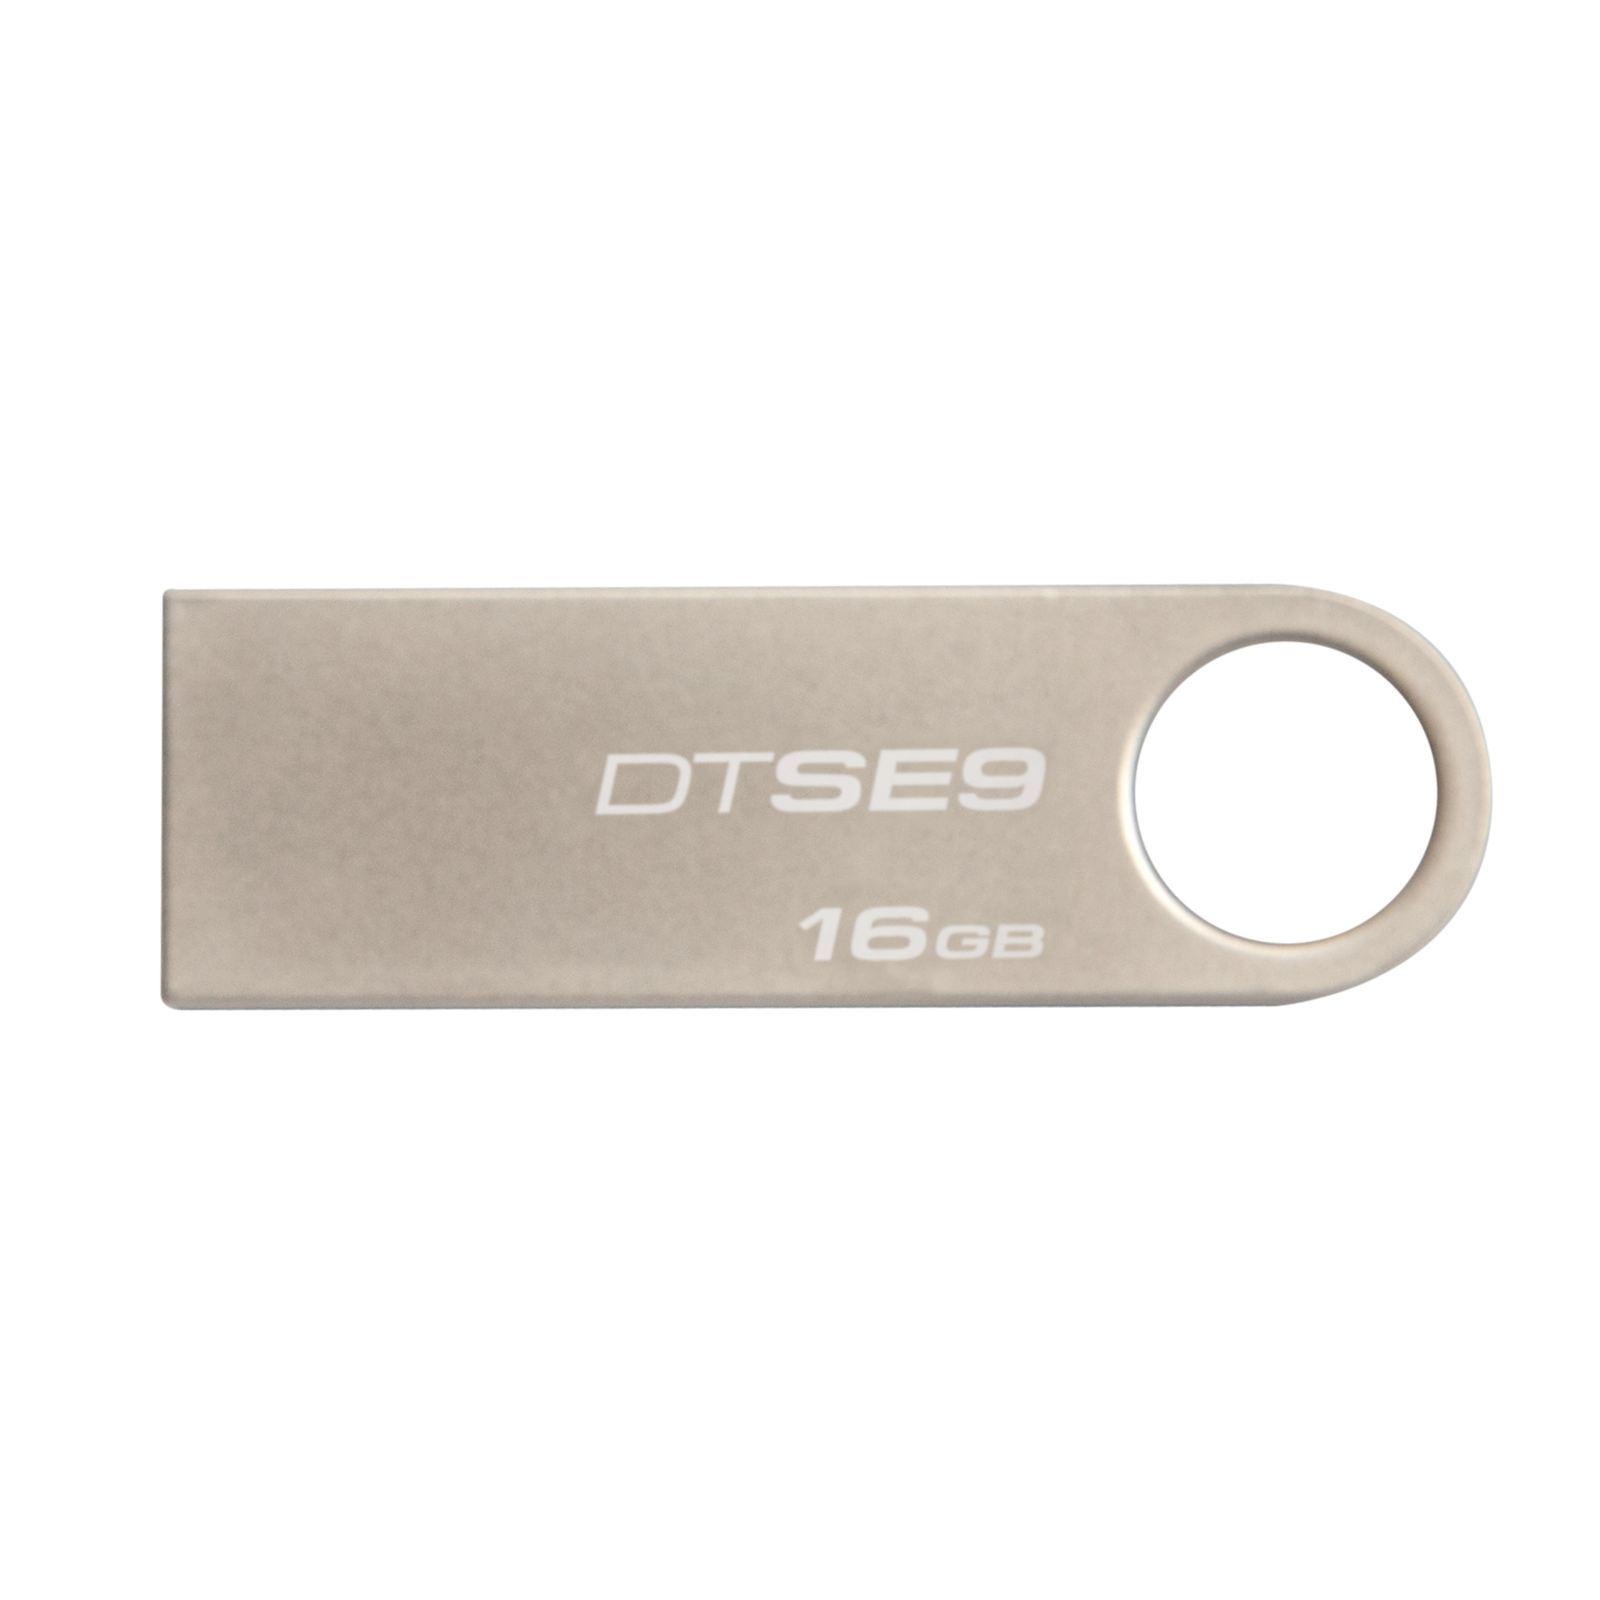 Memoria USB Kingston DataTraveler SE9 16GB USB 2.0 Plata